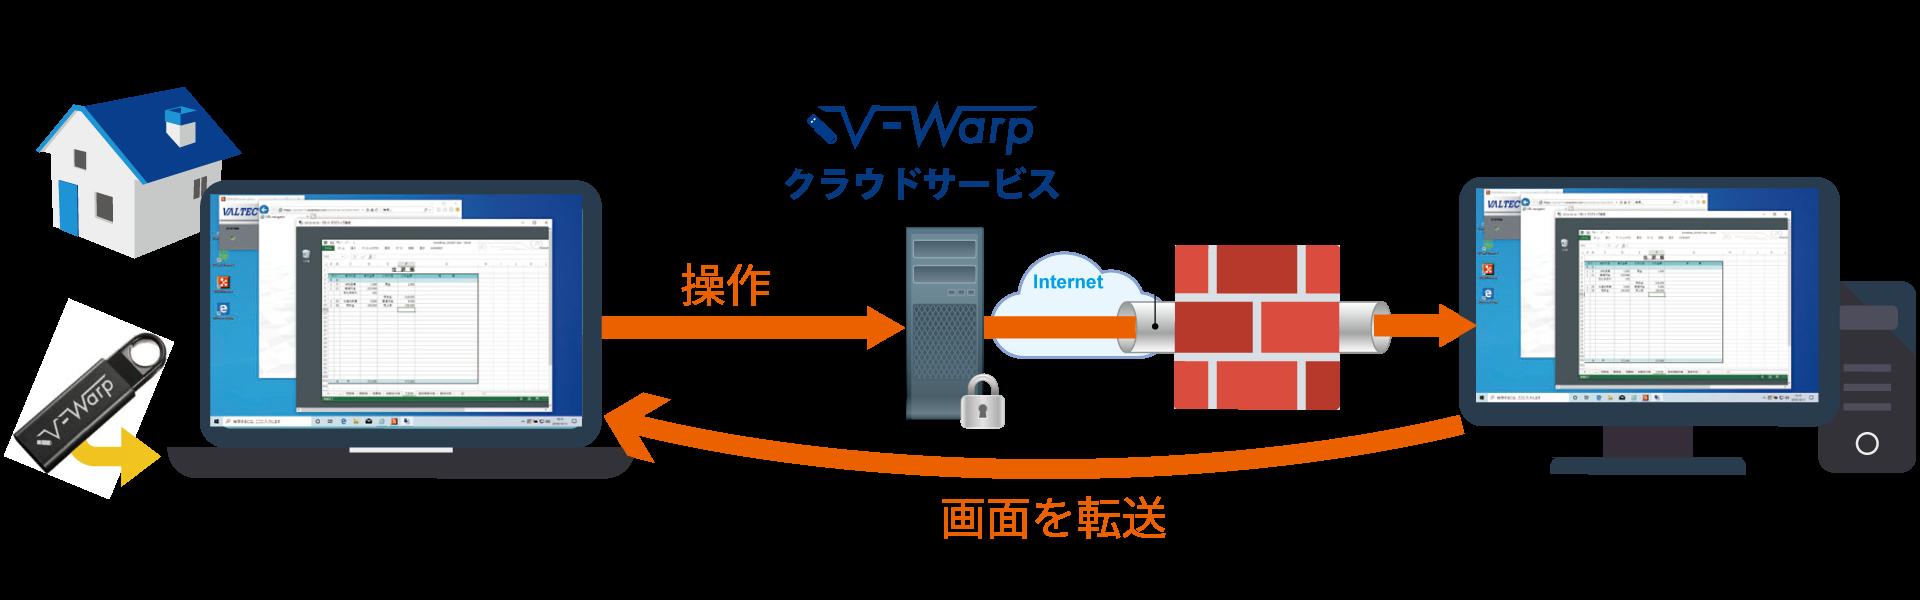 V-Warp-ブイワープ-(リモートアクセスツール)